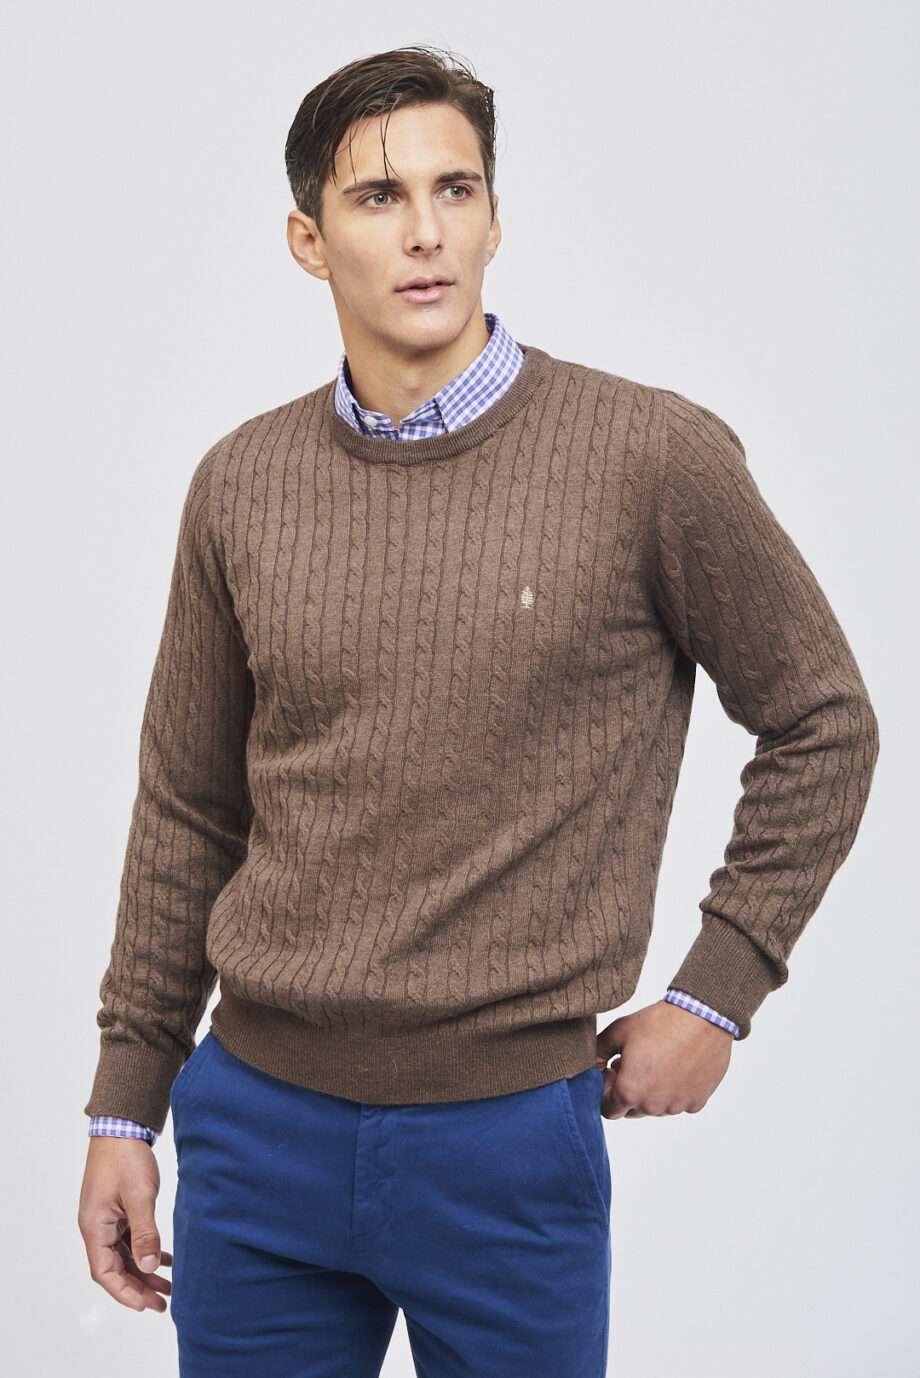 Sweater trenza y canelón de lana liviana